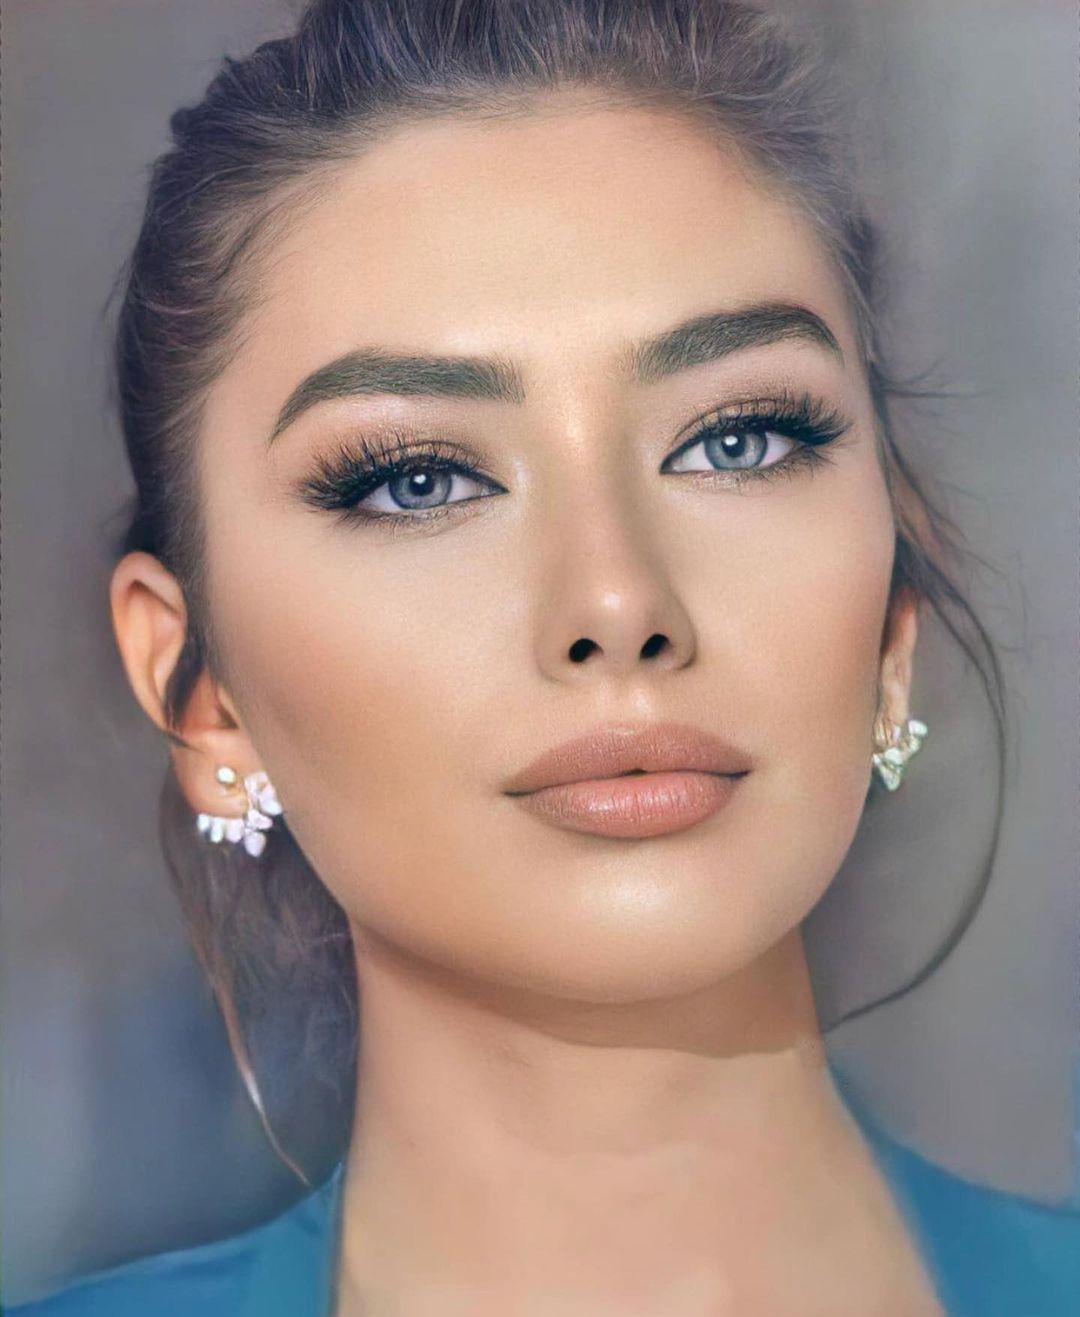 Neslihan Atagul Health Problems In 2021 Turkish Women Beautiful Pretty Girls Selfies Black And White Aesthetic